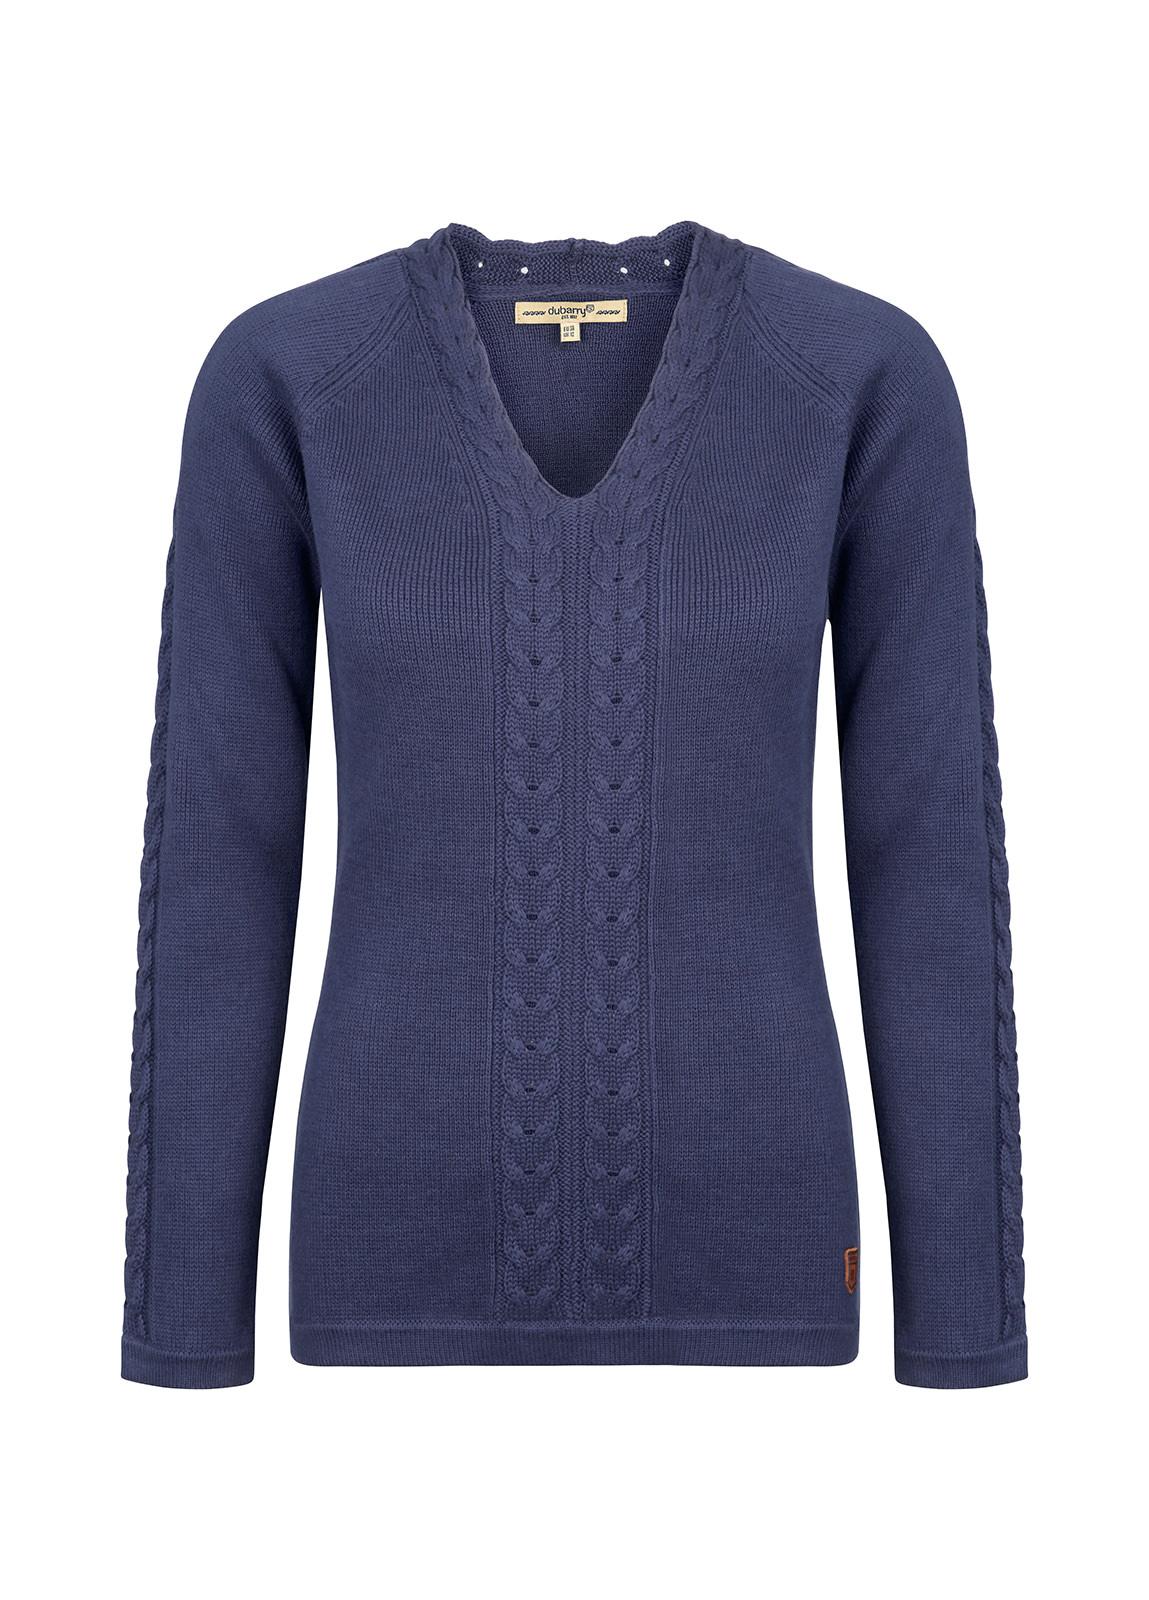 Carolan Women's V-neck Knitted Sweater - Navy